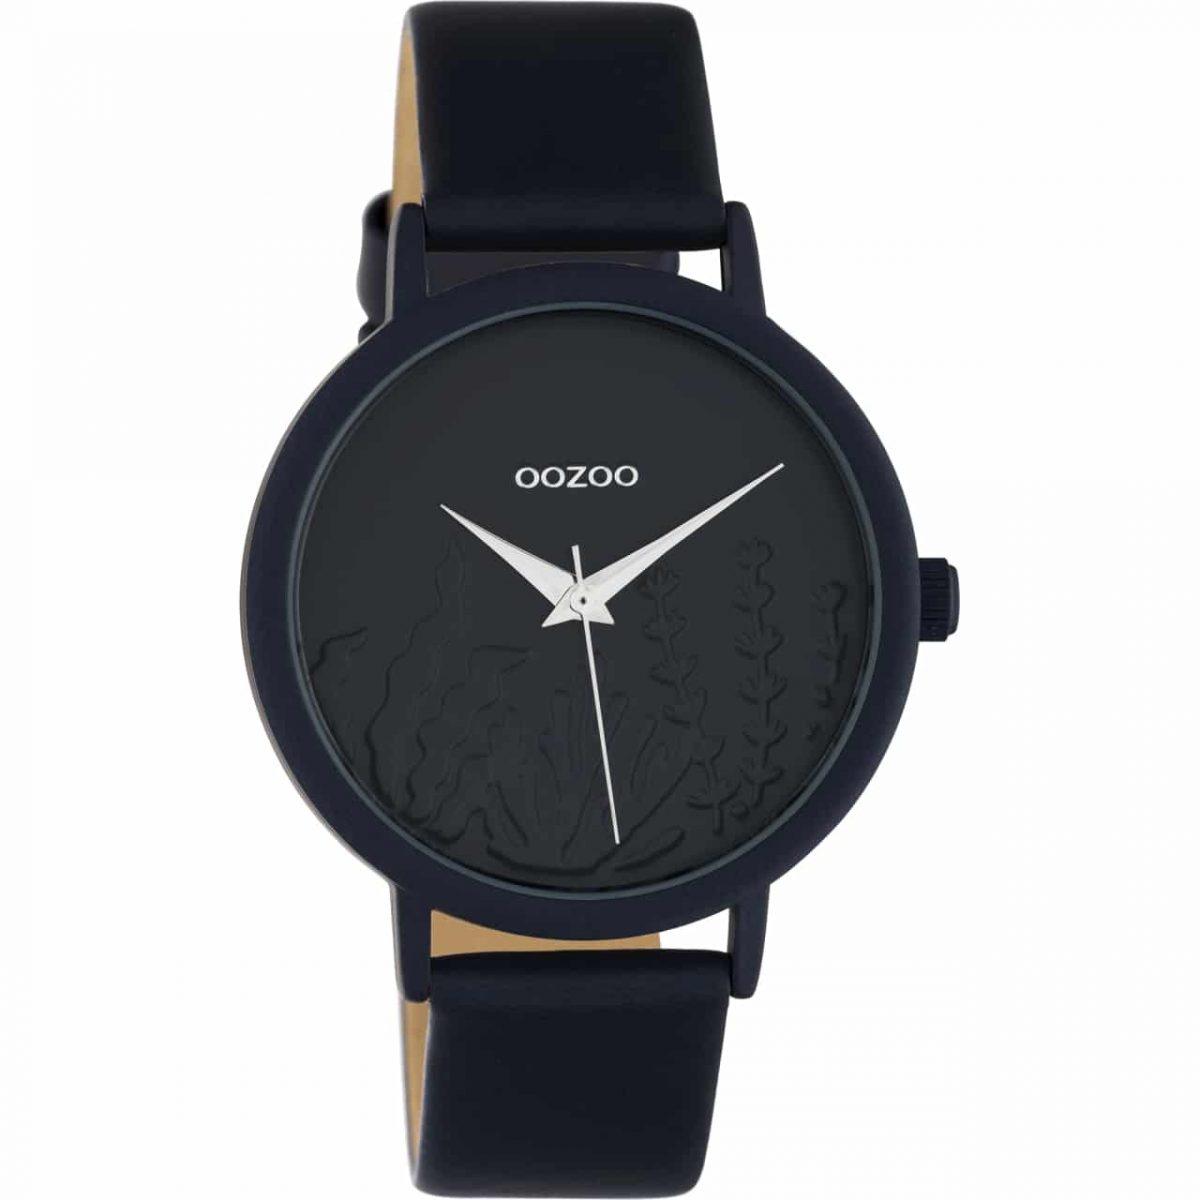 Timepieces Summer 2020 - C10607 - OOZOO